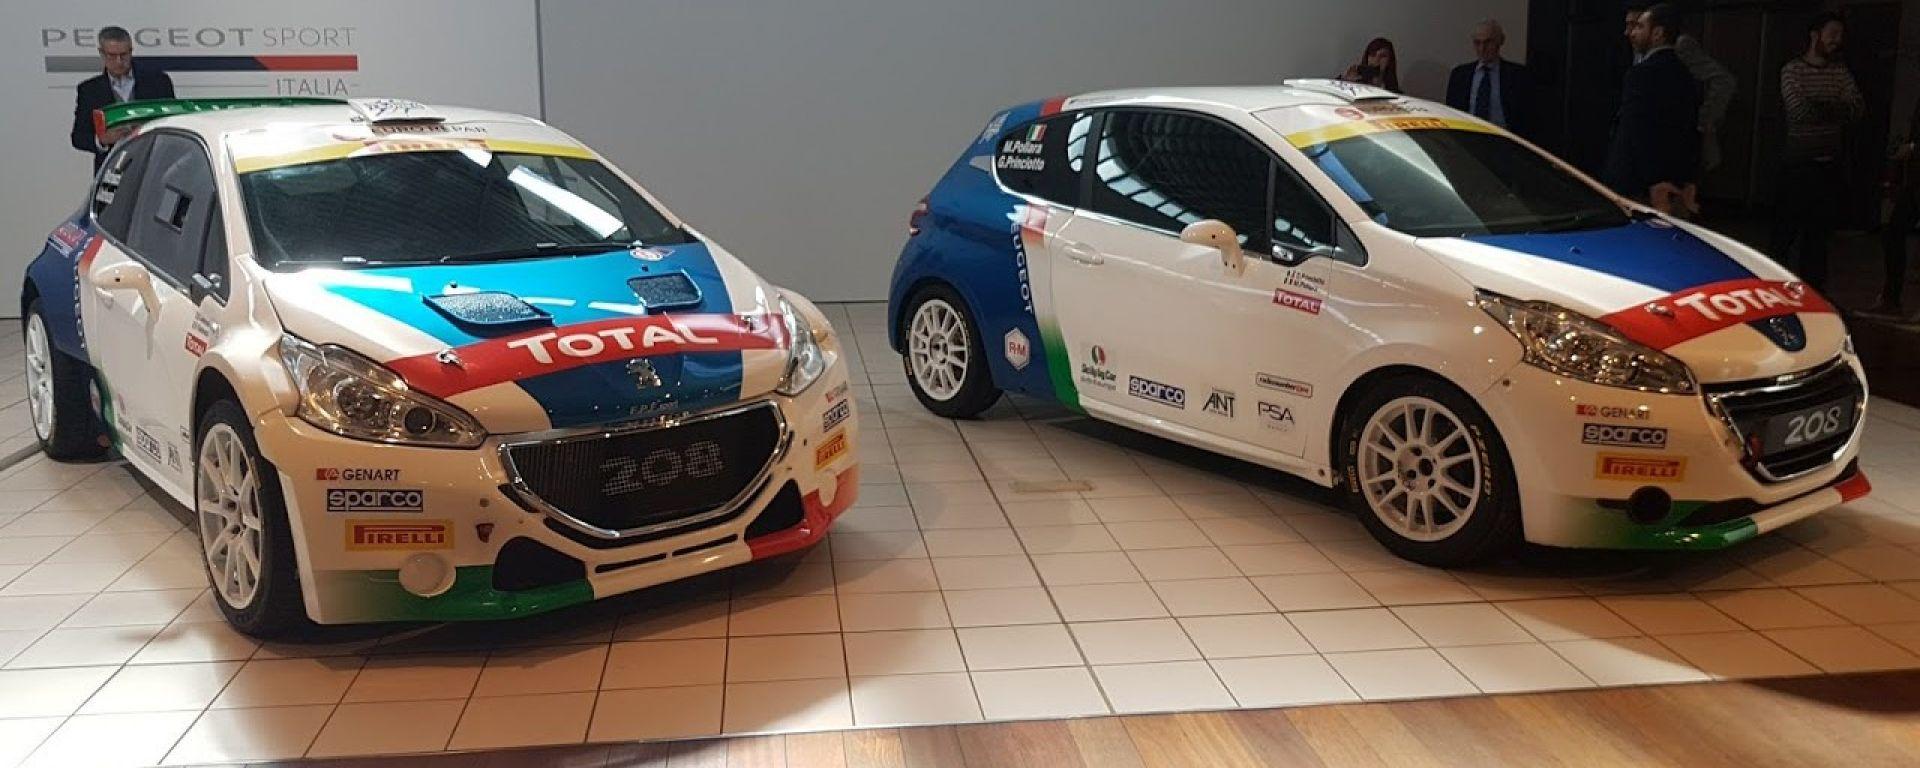 Le due Peugeot del Team Peugeot Sport Italia